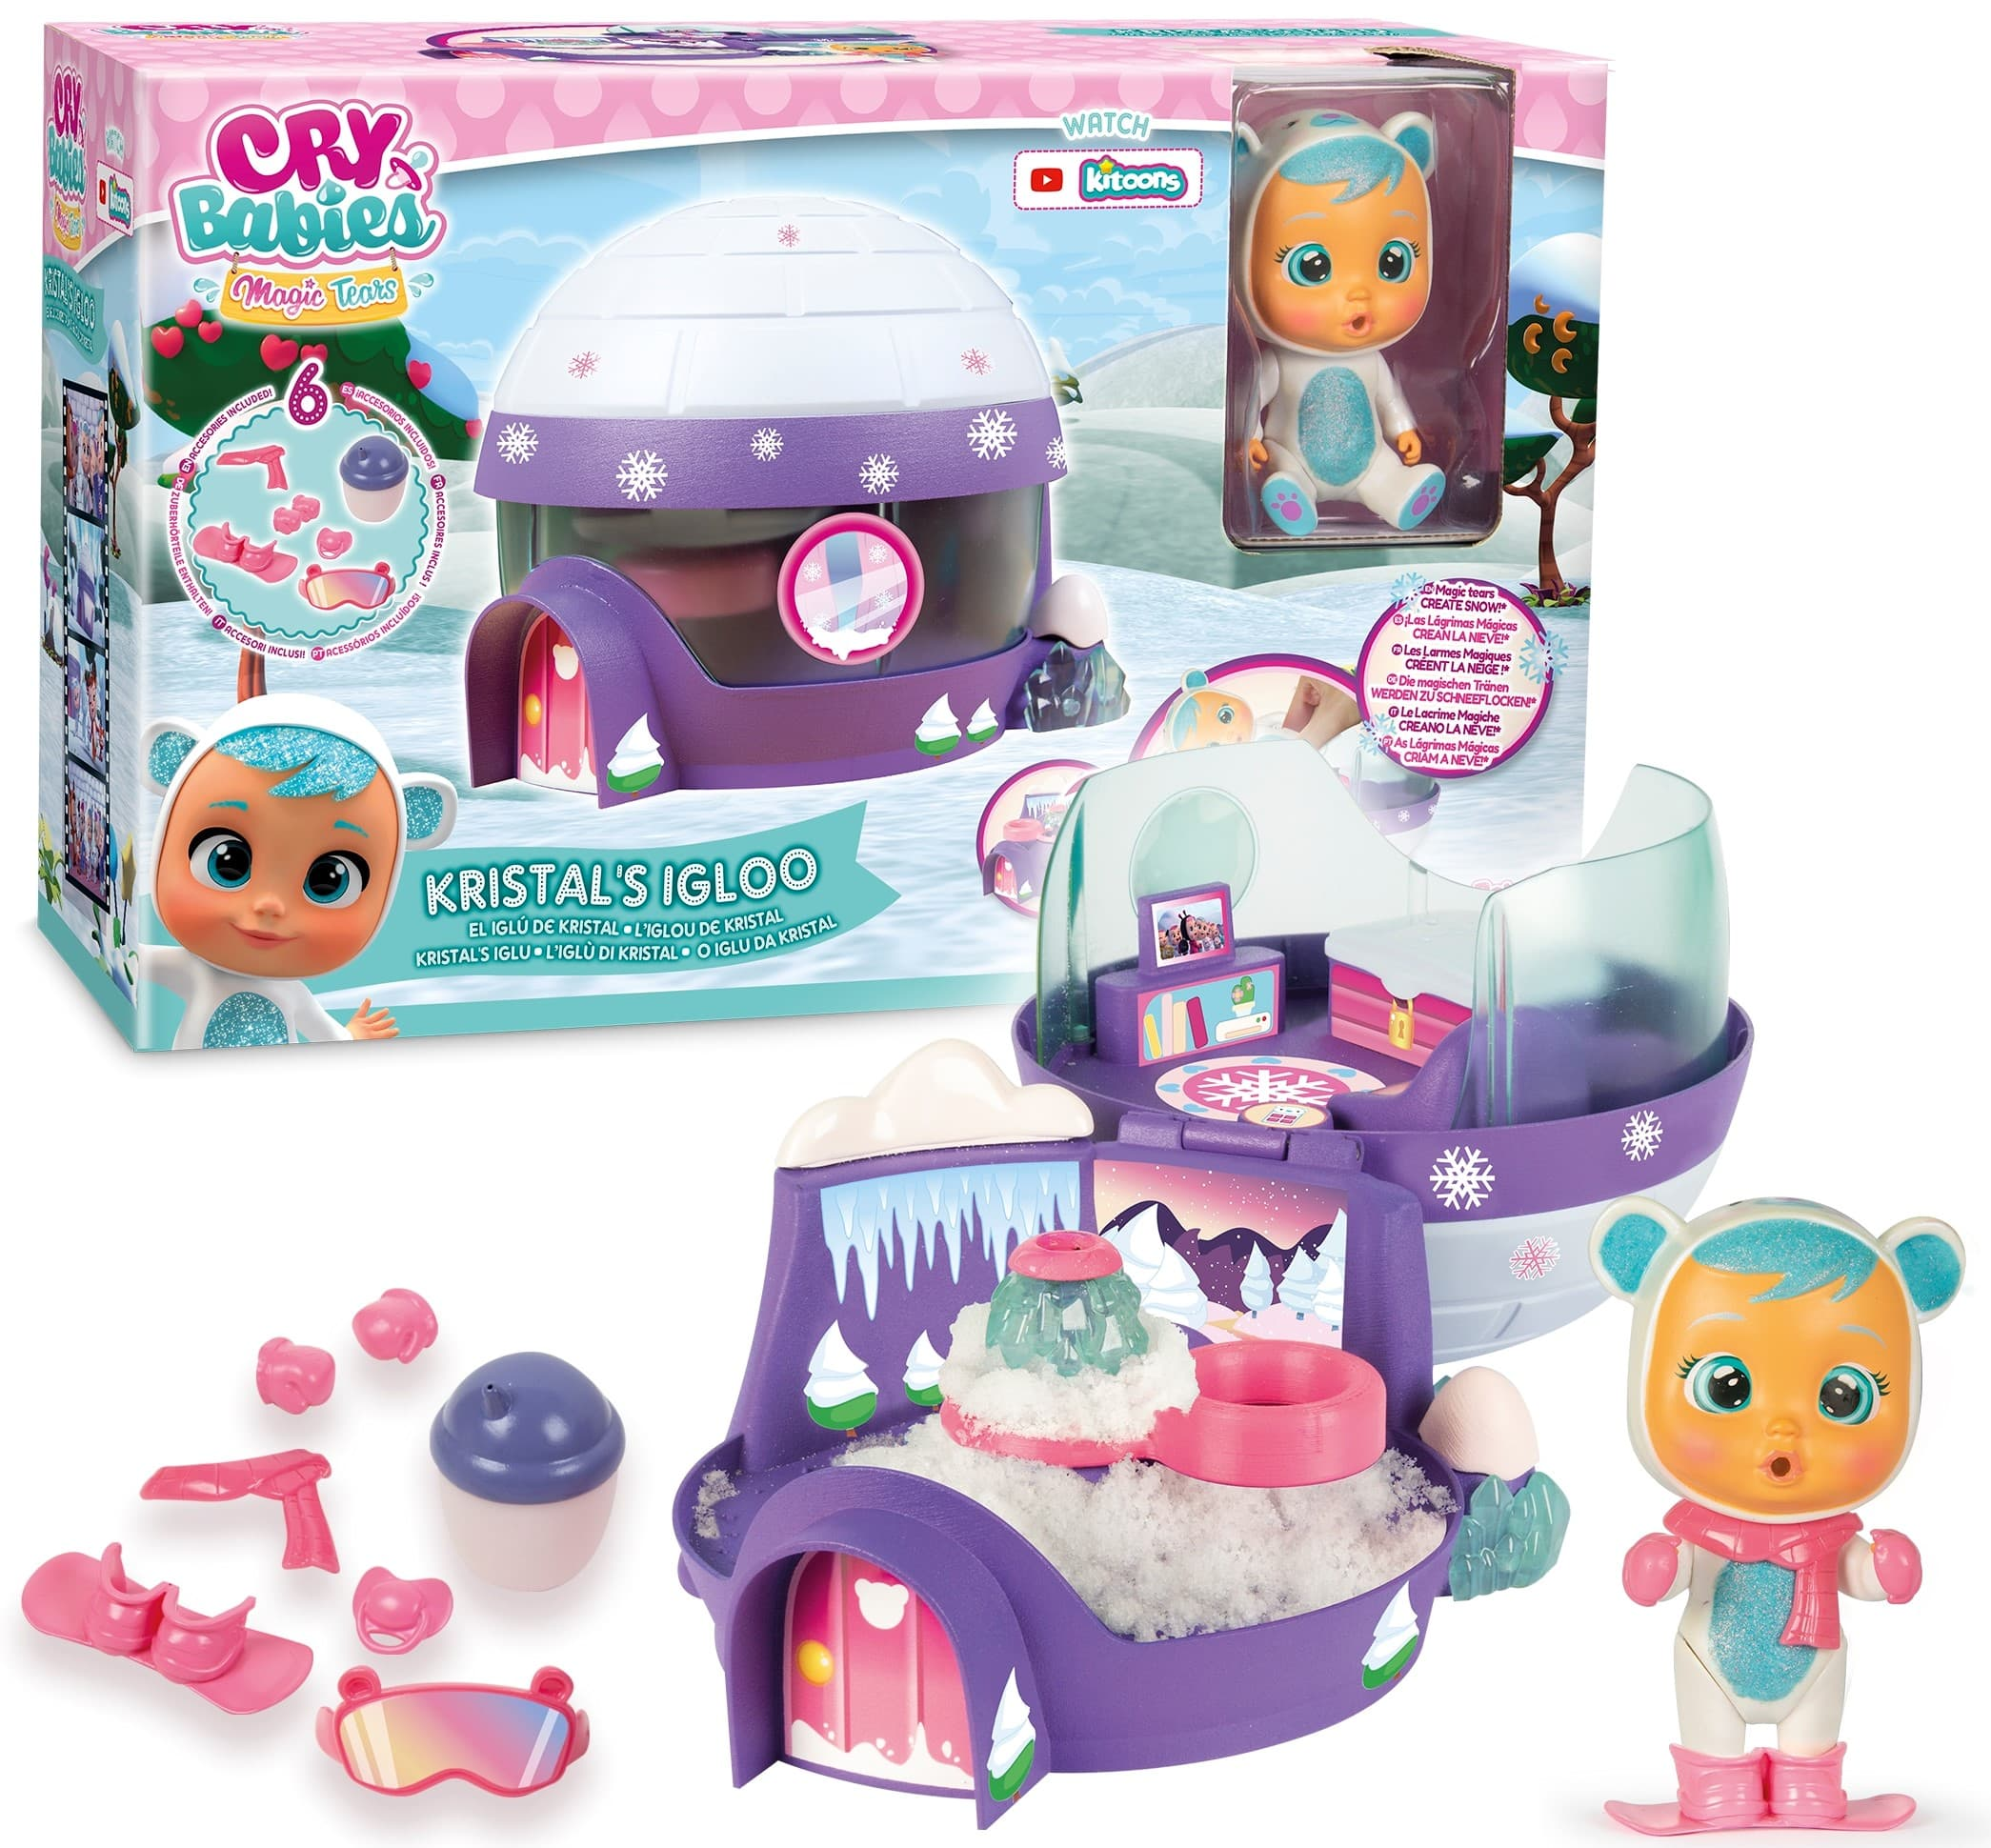 Cry Babies Magic Tears Kristal's Igloo Playset $10 + Free Shipping w/ Amazon Prime or Orders $25+